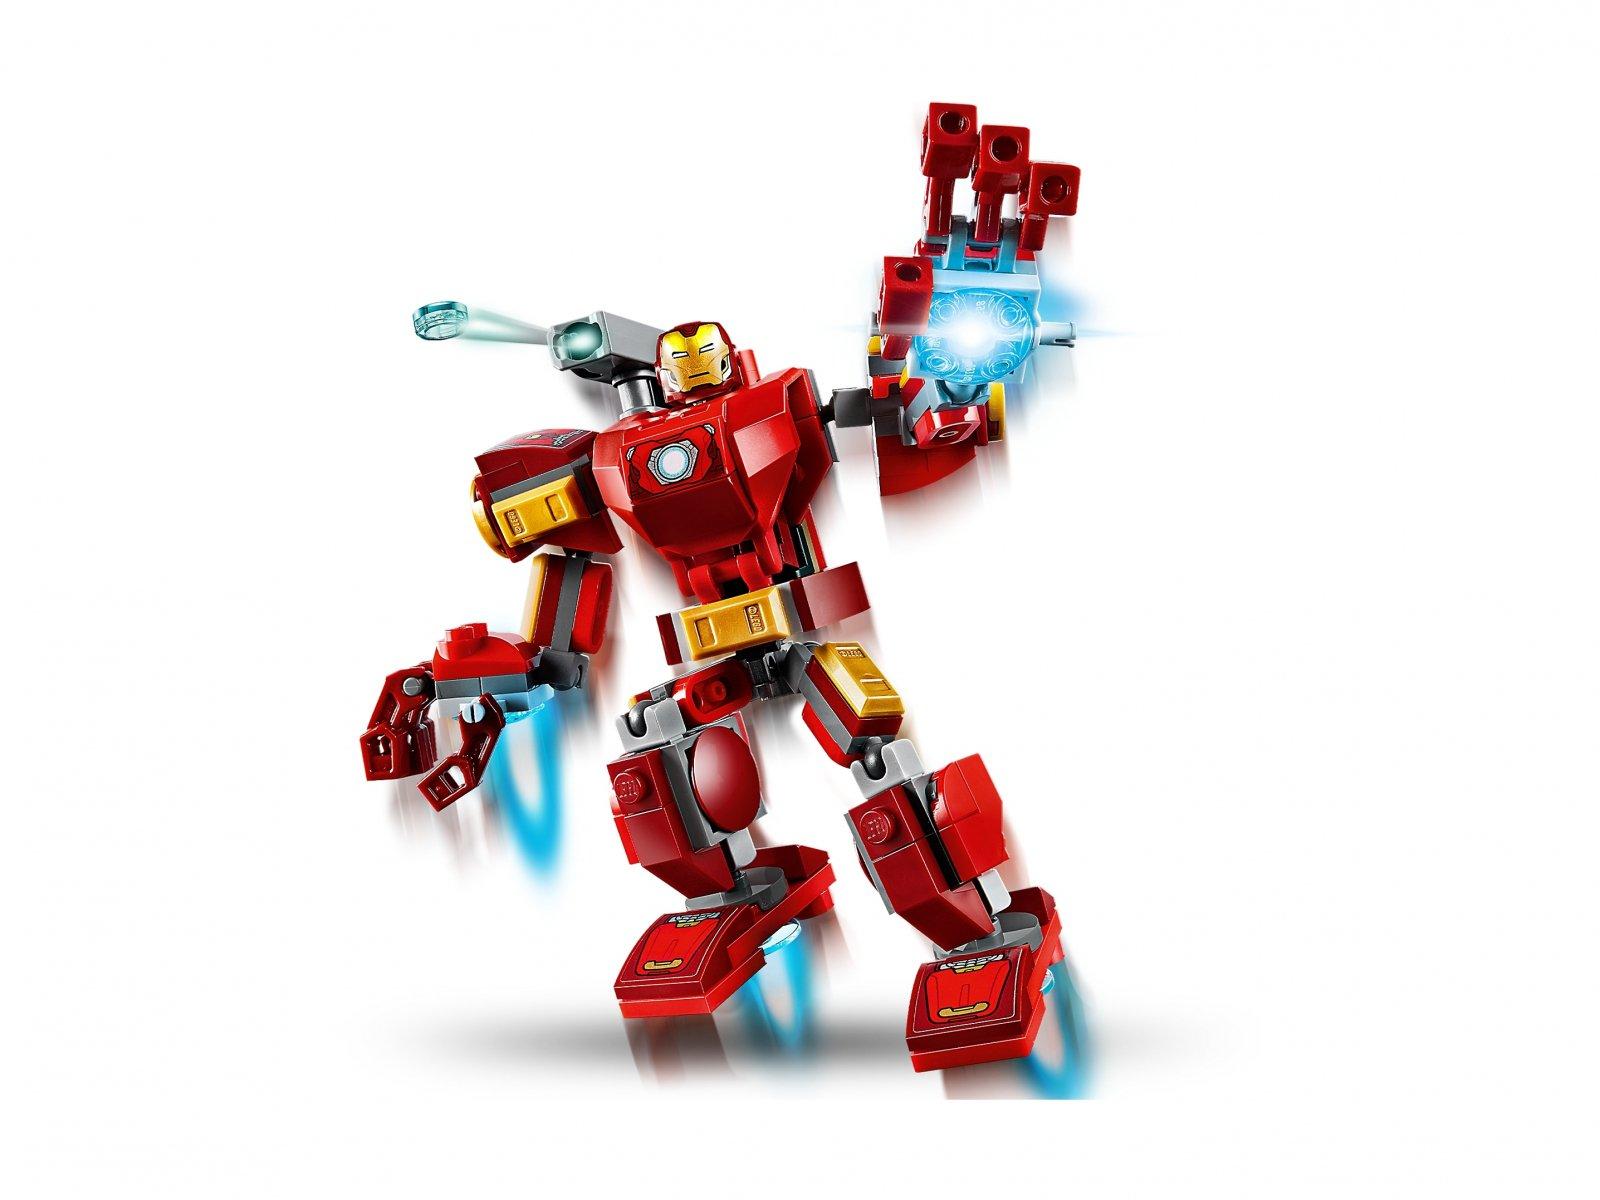 LEGO Marvel Avengers 76140 Mech Iron Mana